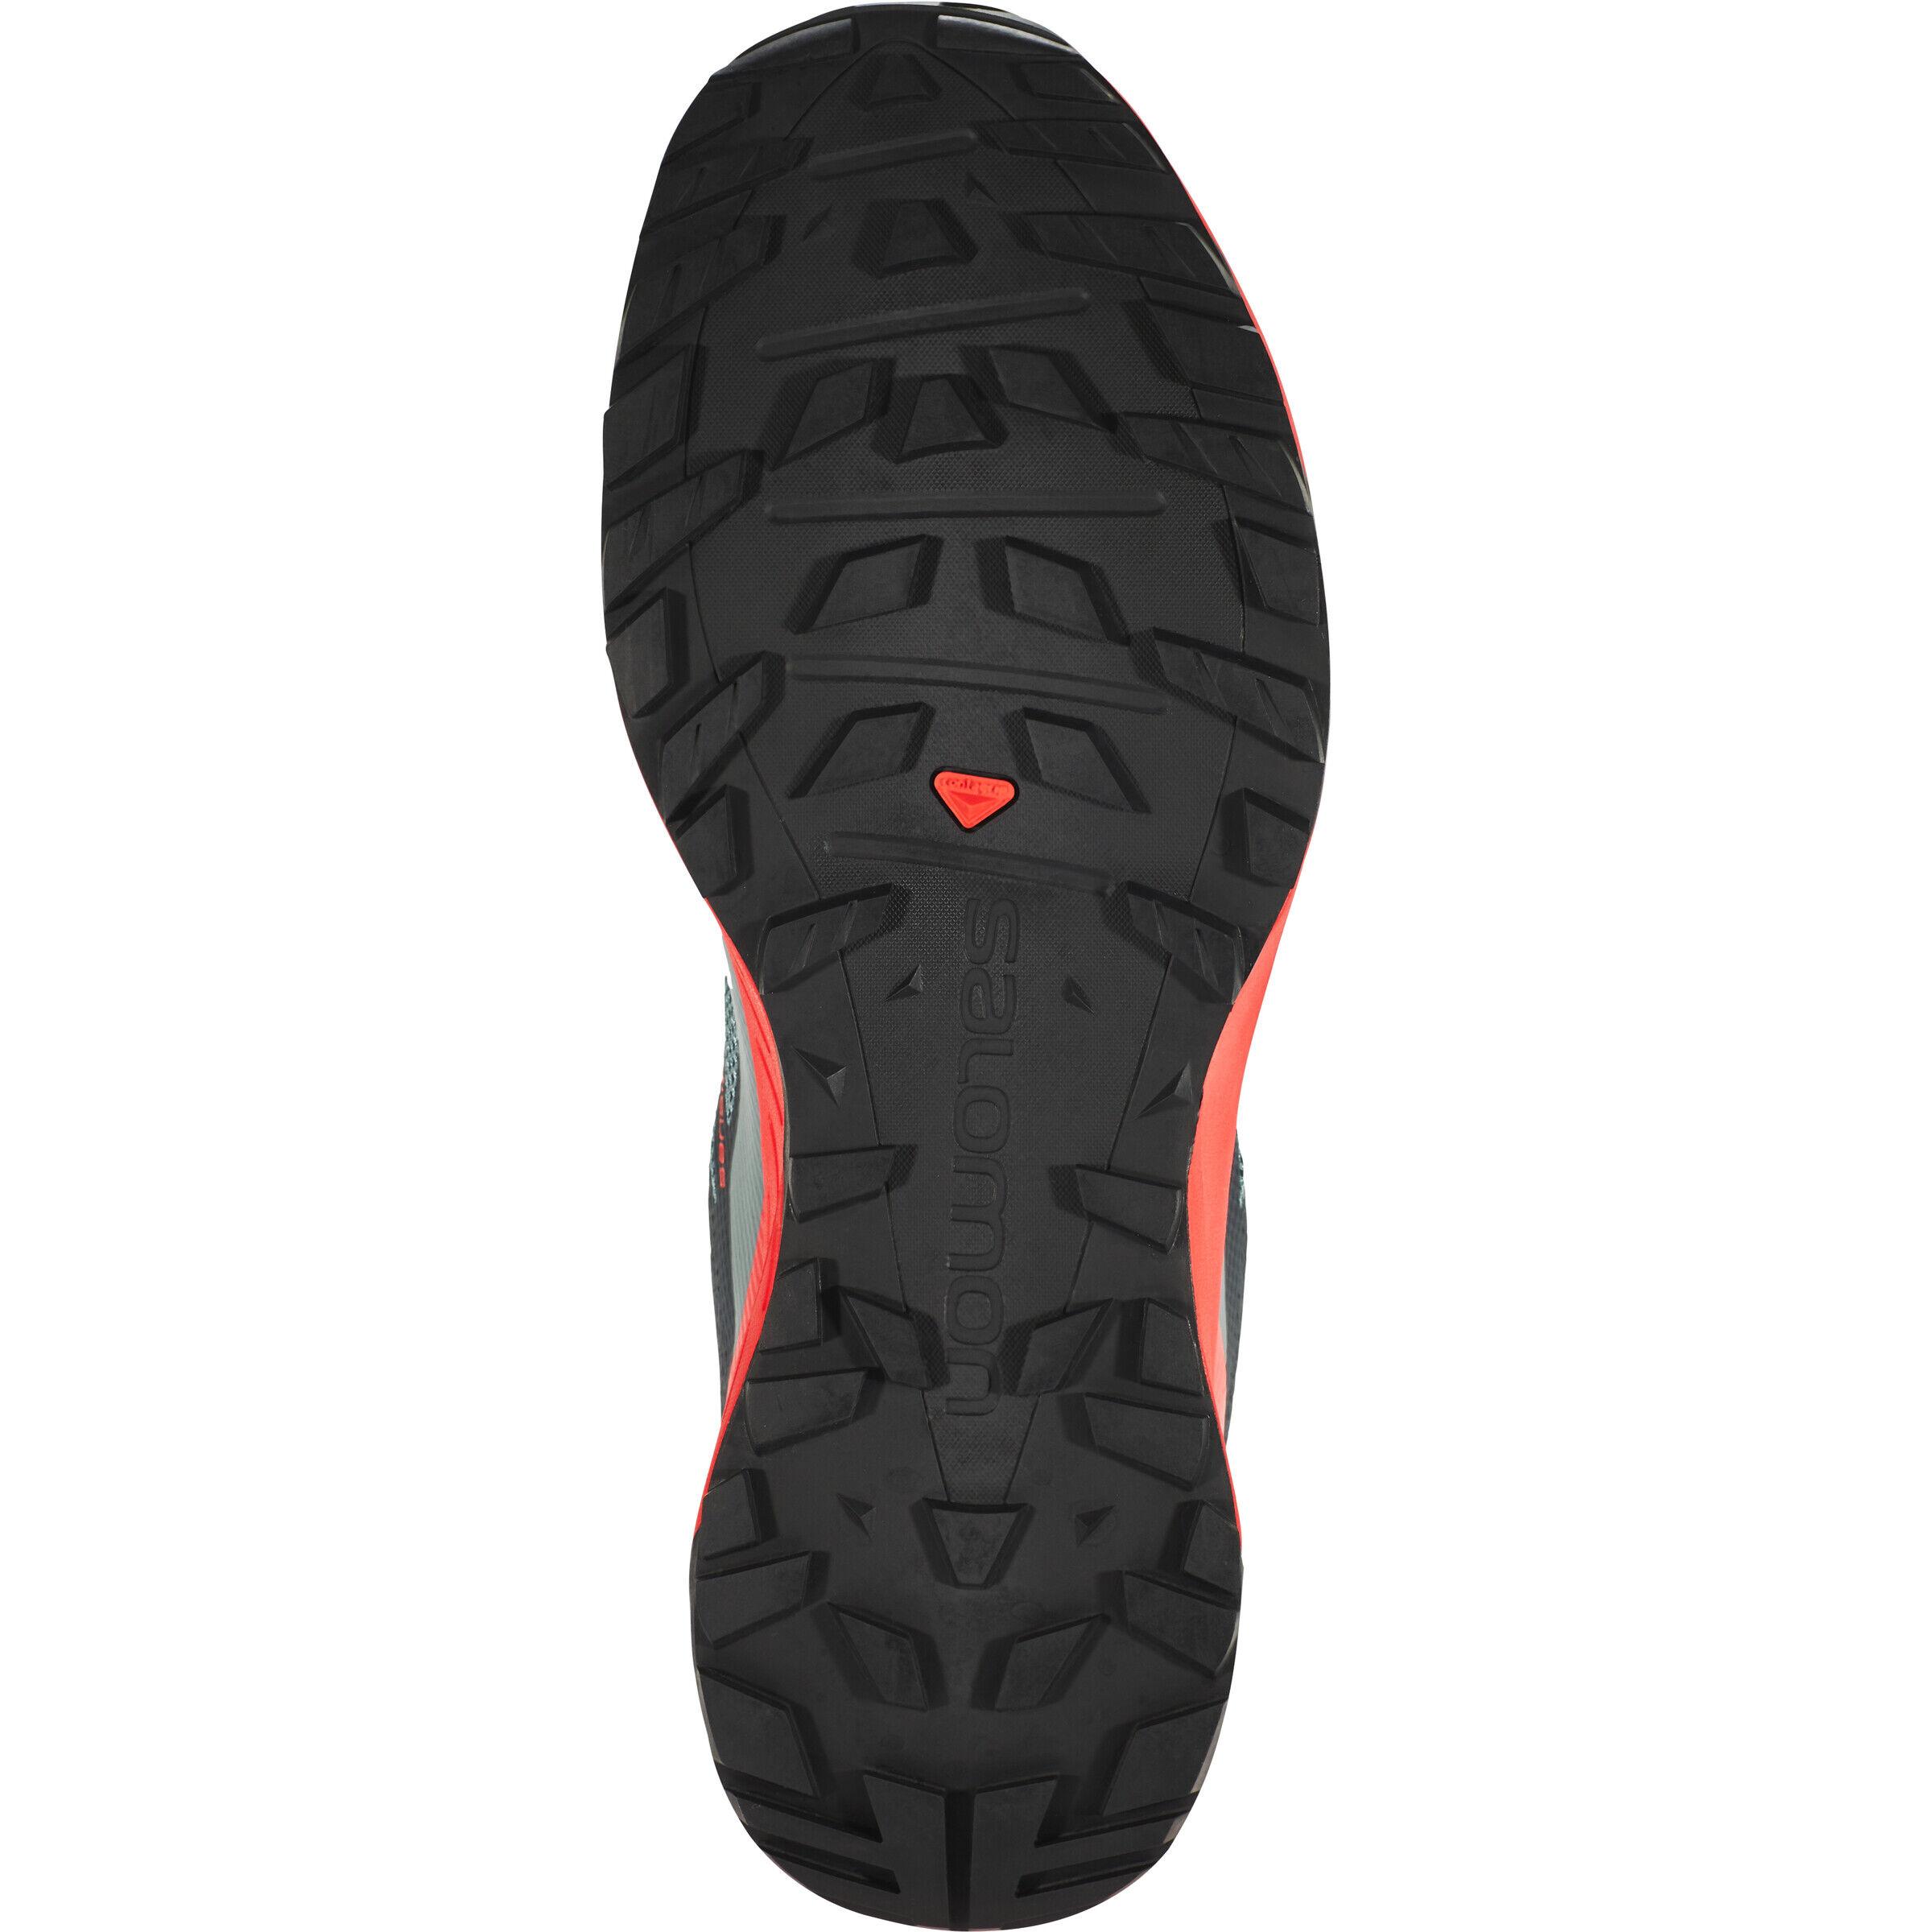 Schuhe SALOMON Xa Discovery Gtx GORE TEX 409179 29 W0